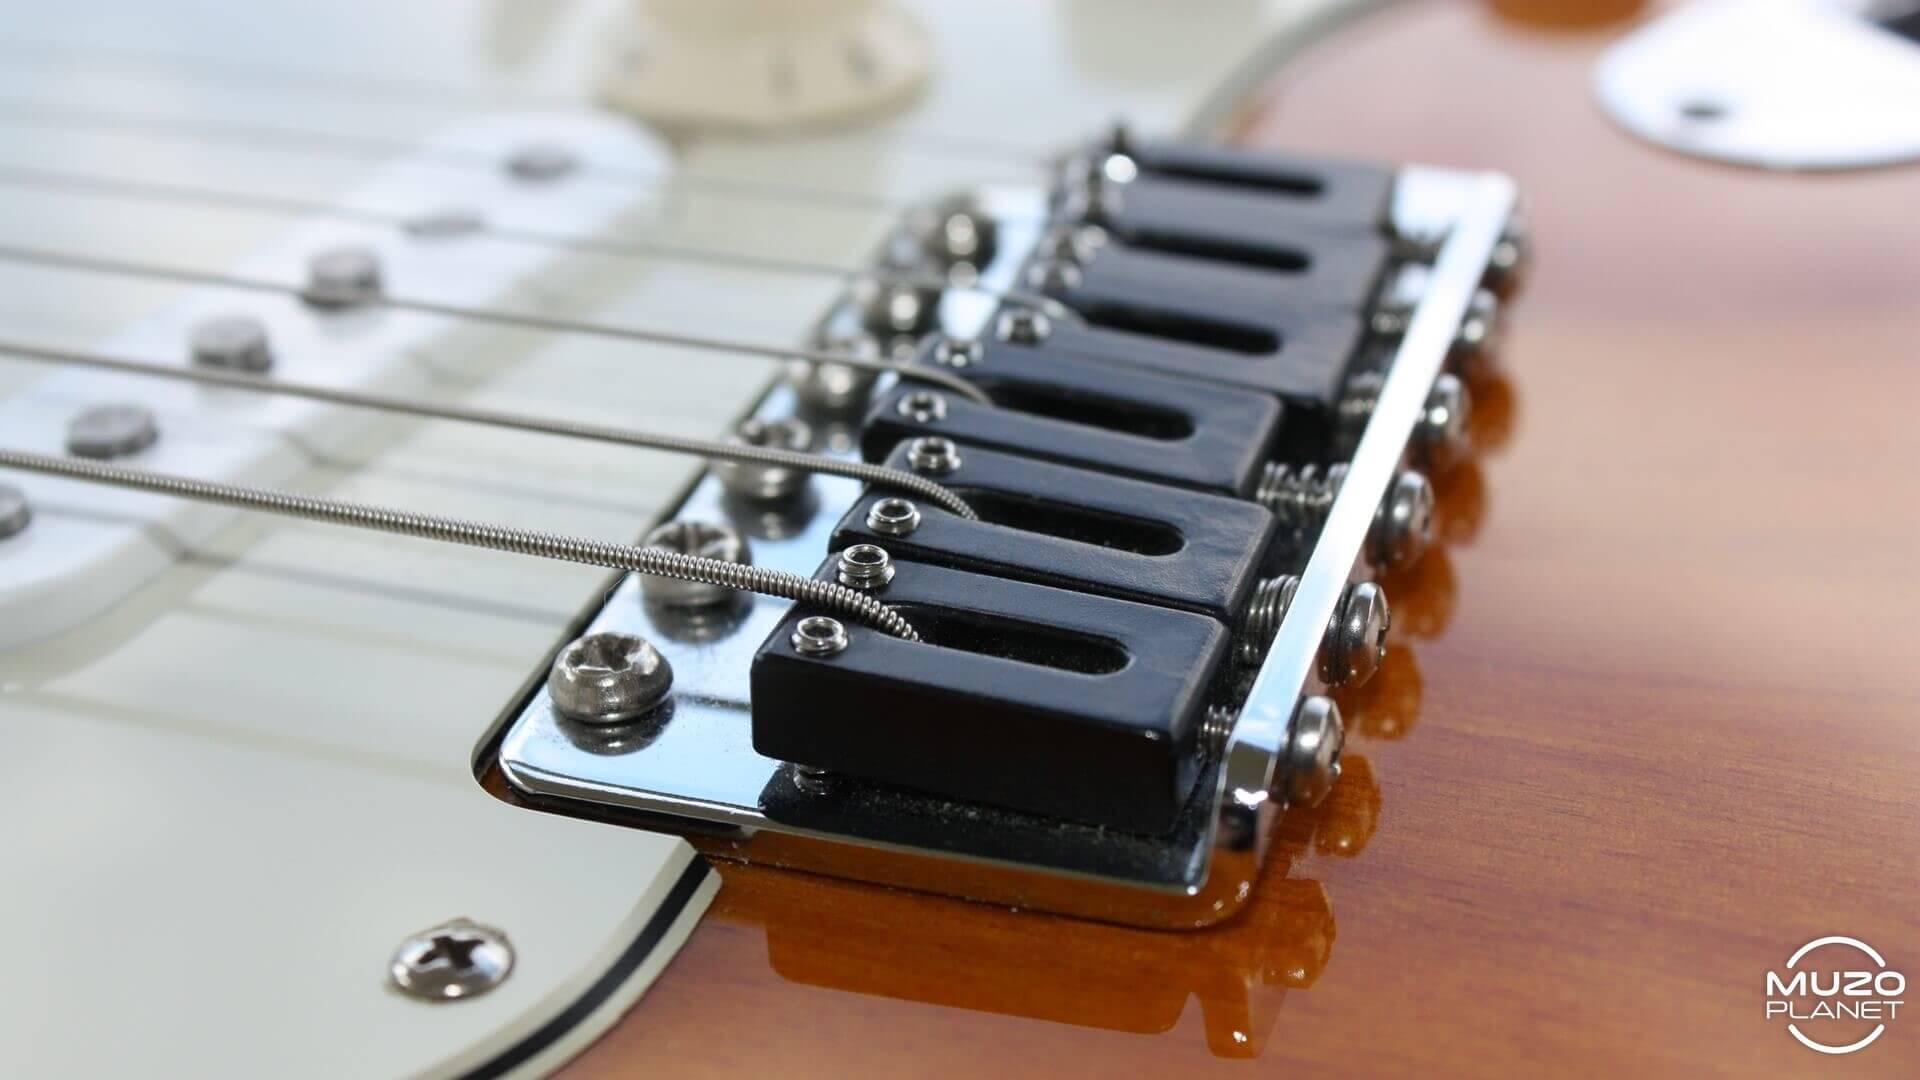 Stratocaster mods Graphtec String Savers saddles muzoplanet